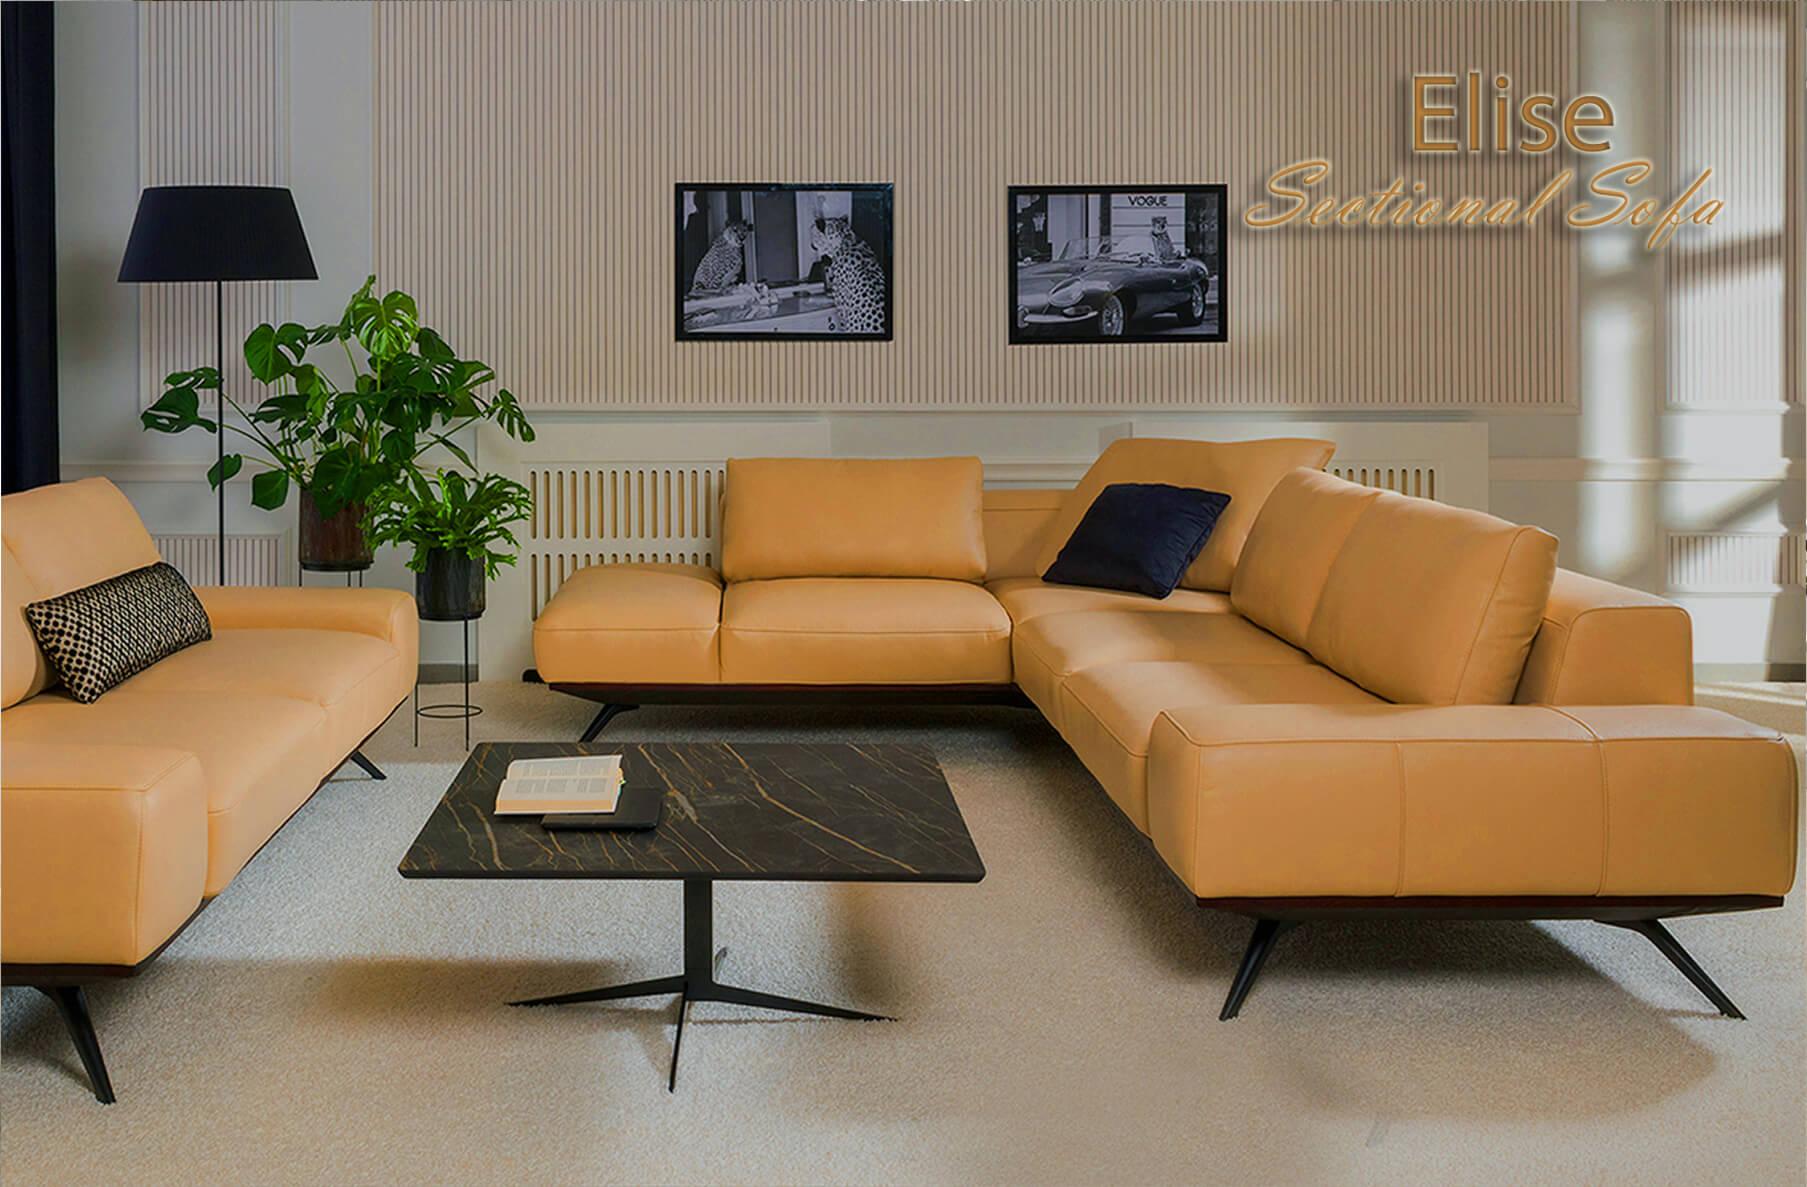 Elise sectional sofa, Cheap